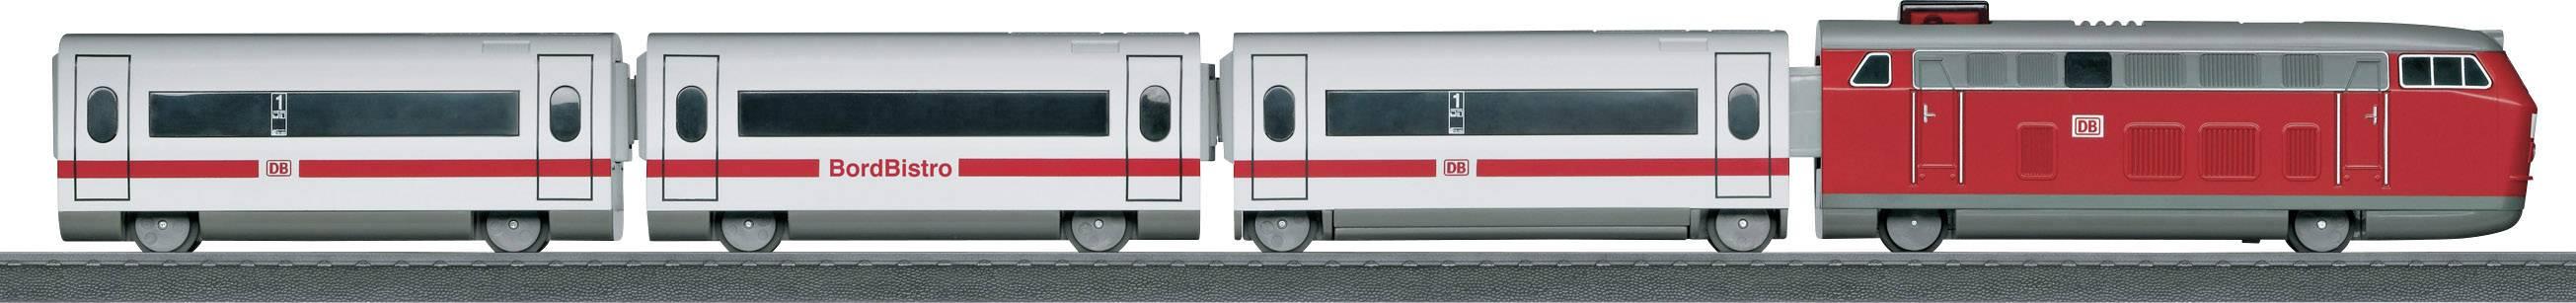 Štartovacia sada vlaku Intercity Märklin my world 29302 H0